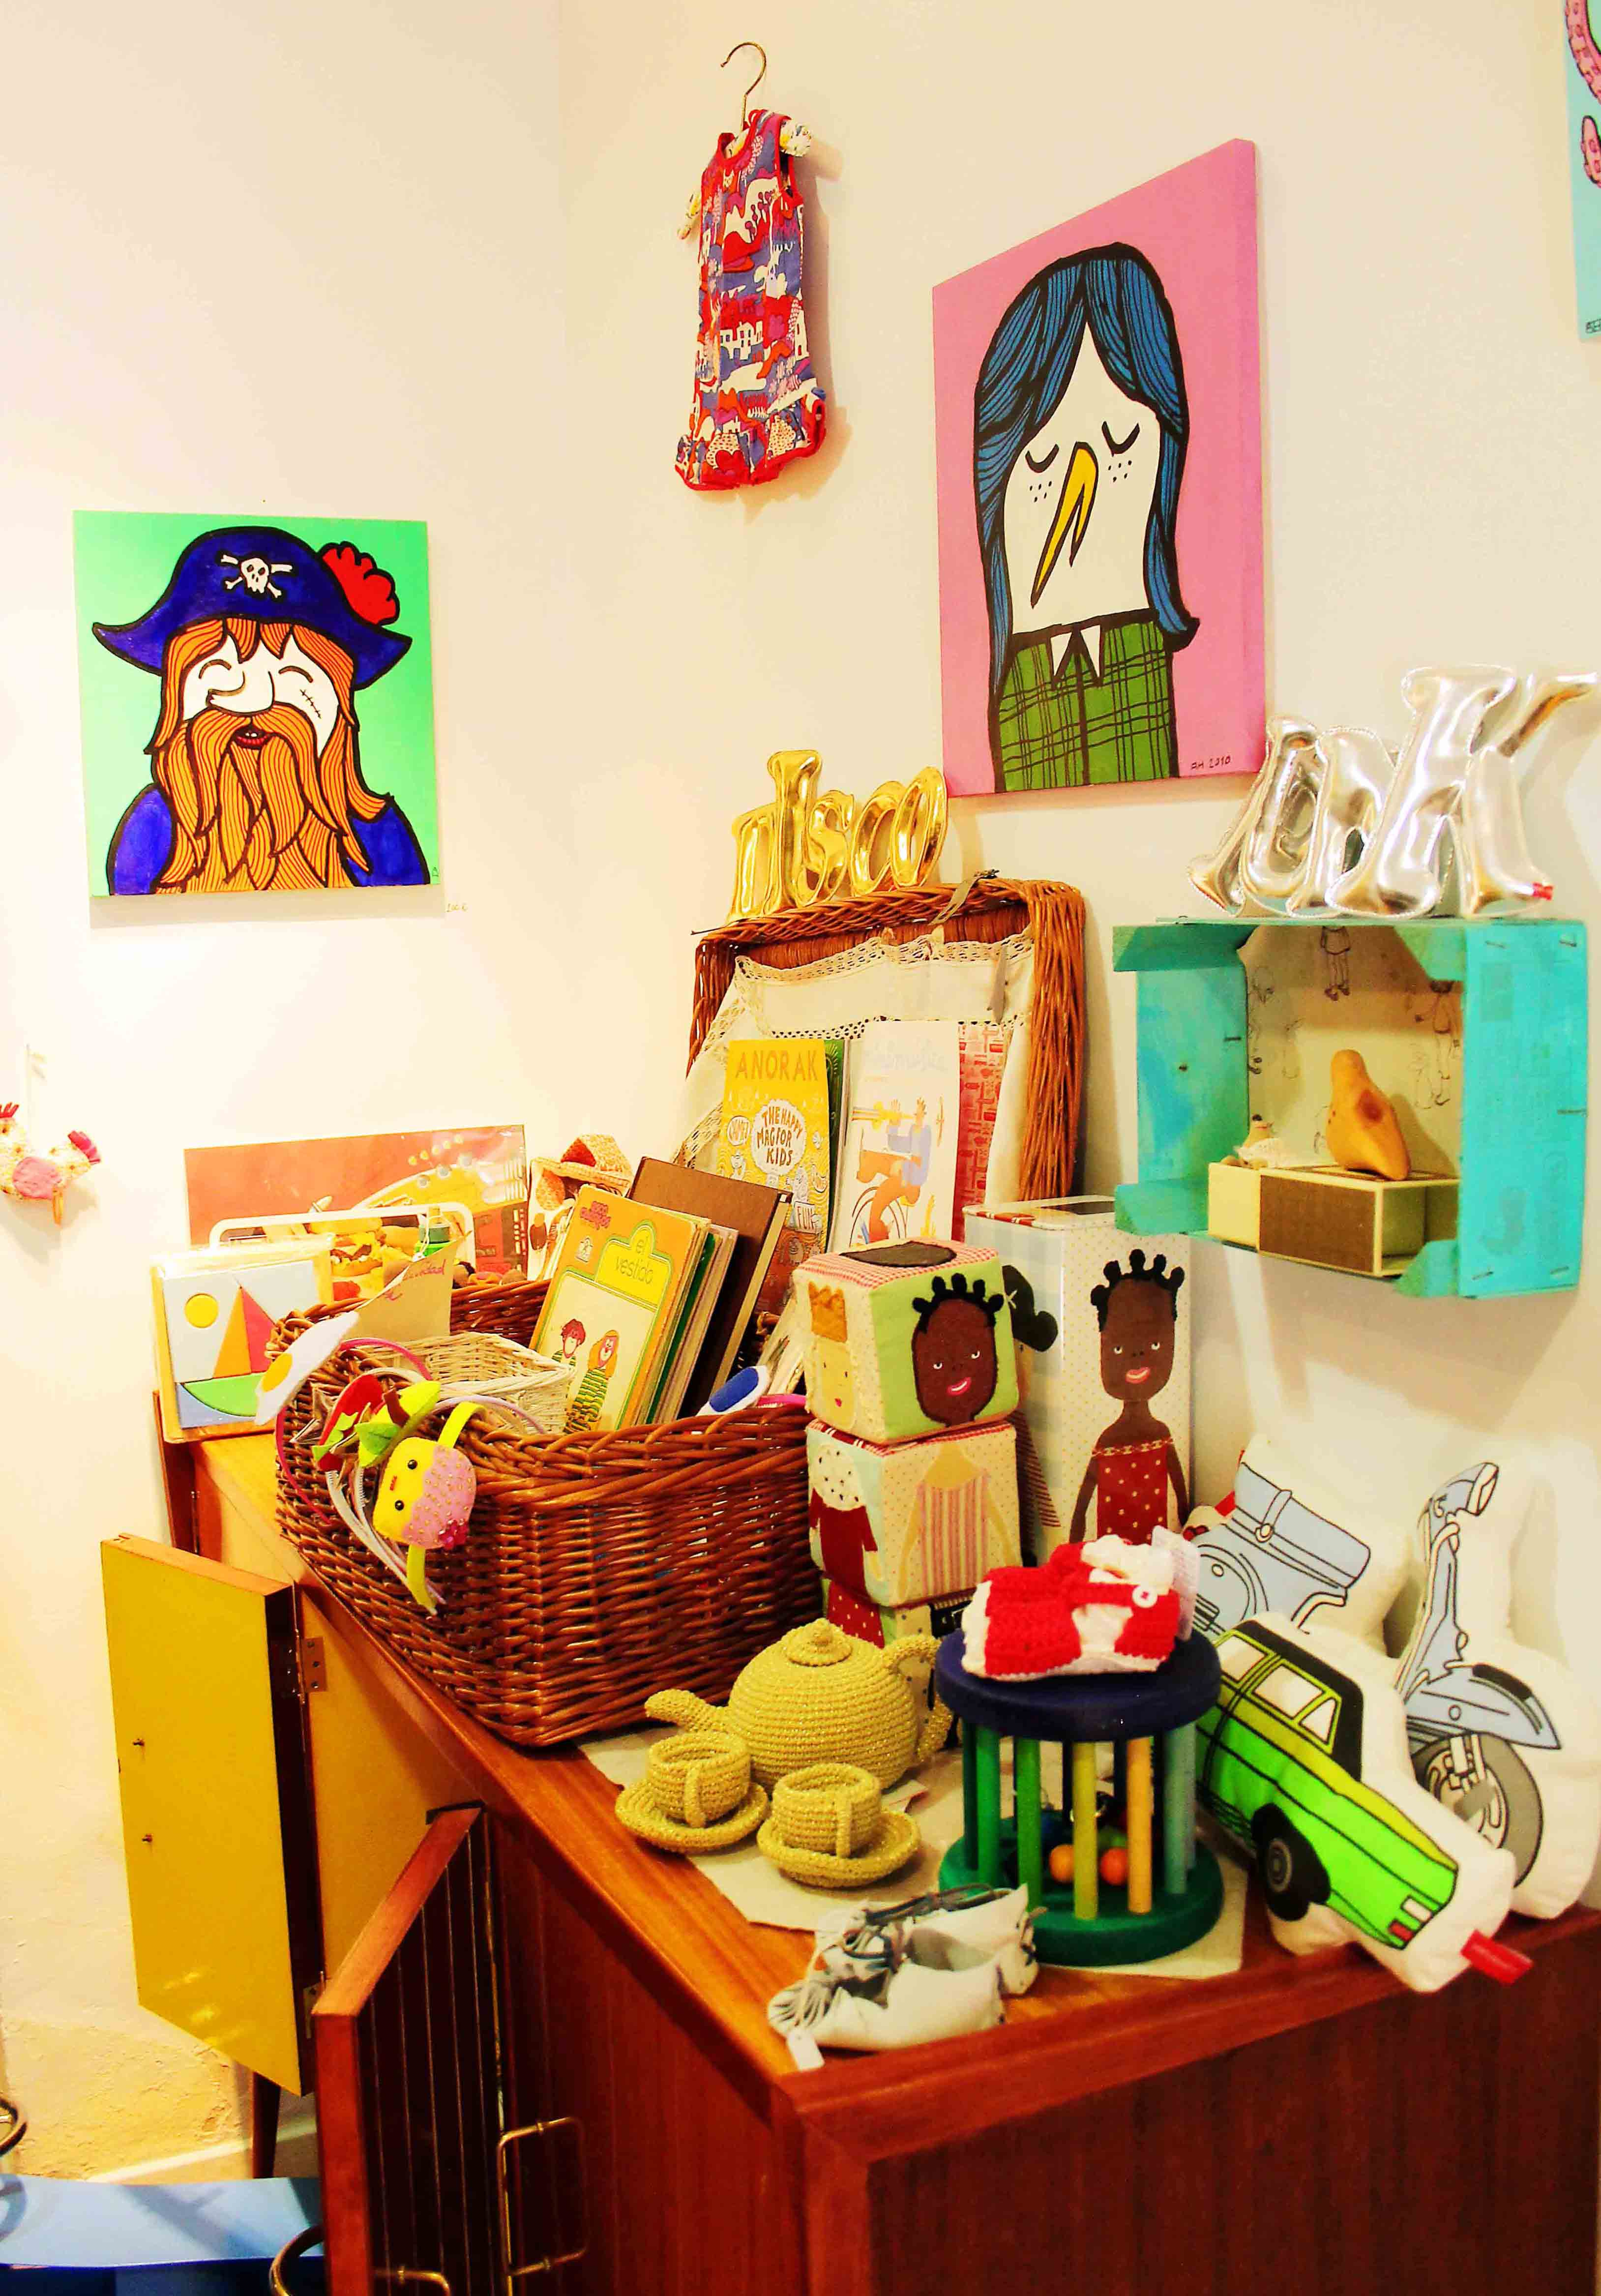 De caja de frutas a estanter a diy con botas de agua for Crear decoraciones para casa